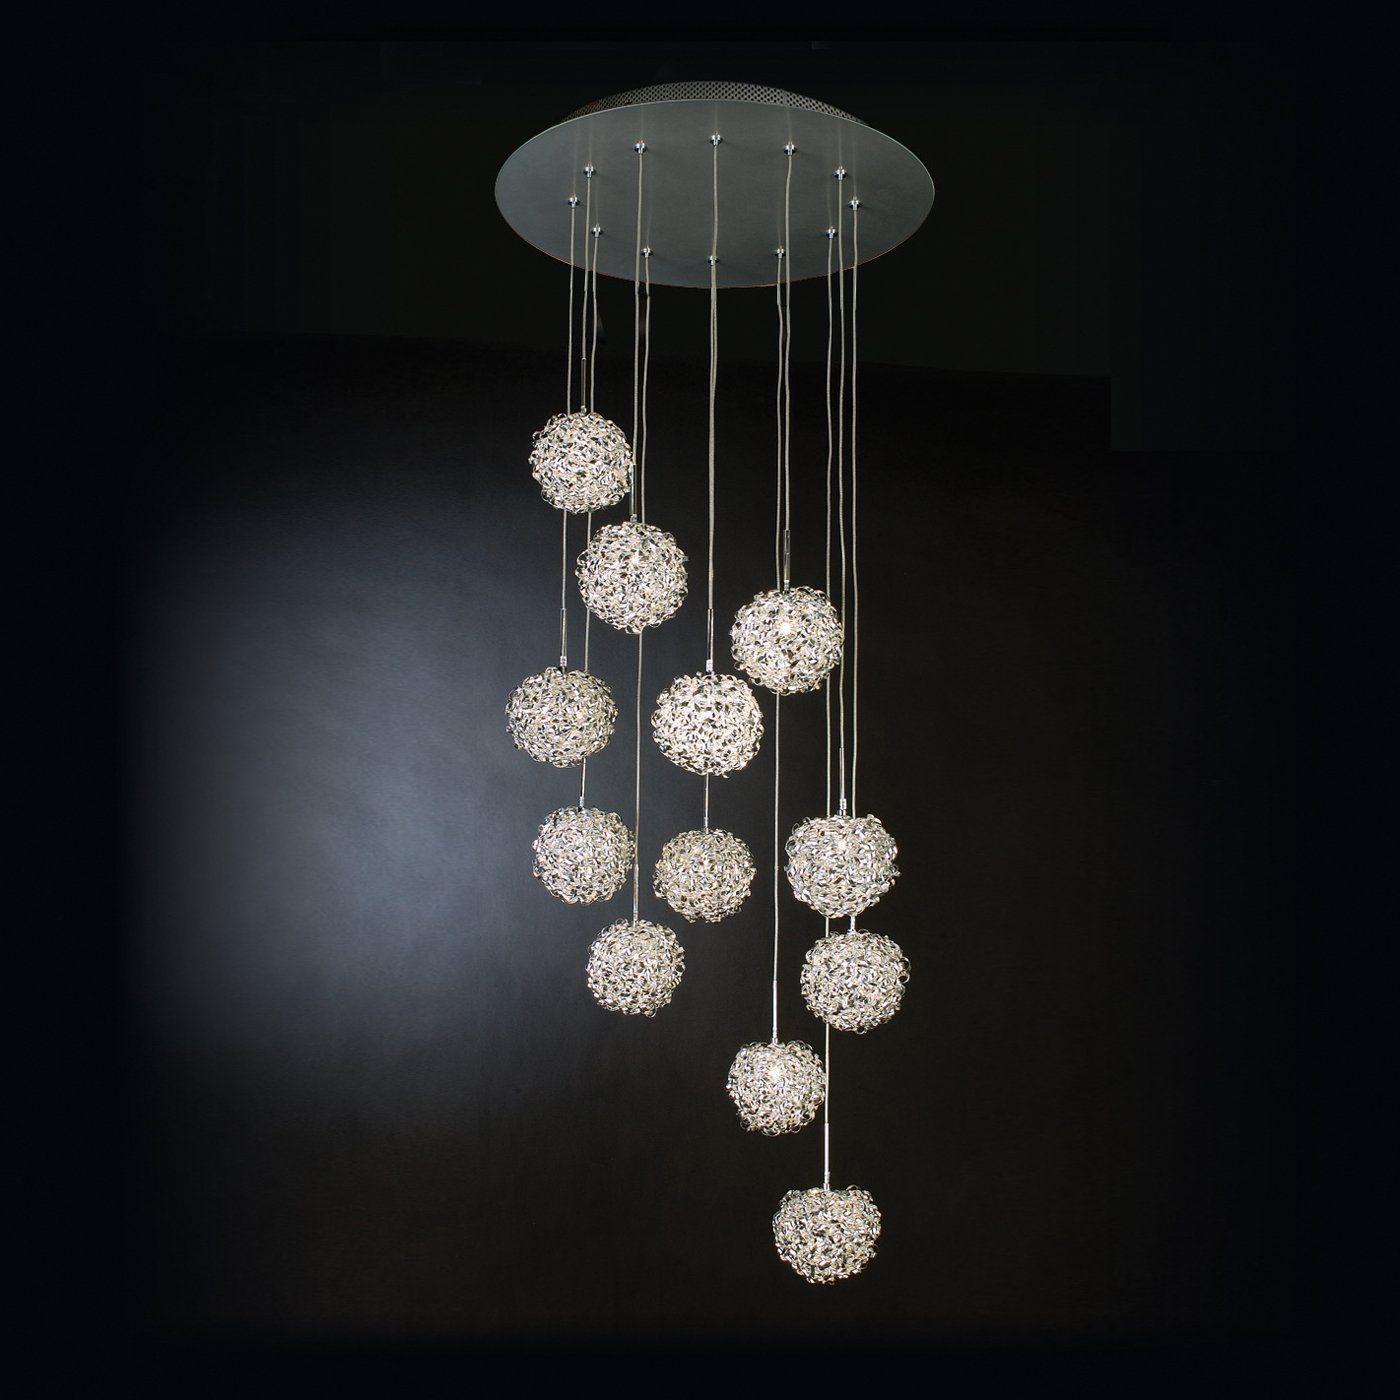 Trend Lighting TP4374 12 Light Snow Ball Chandelier MultiLight